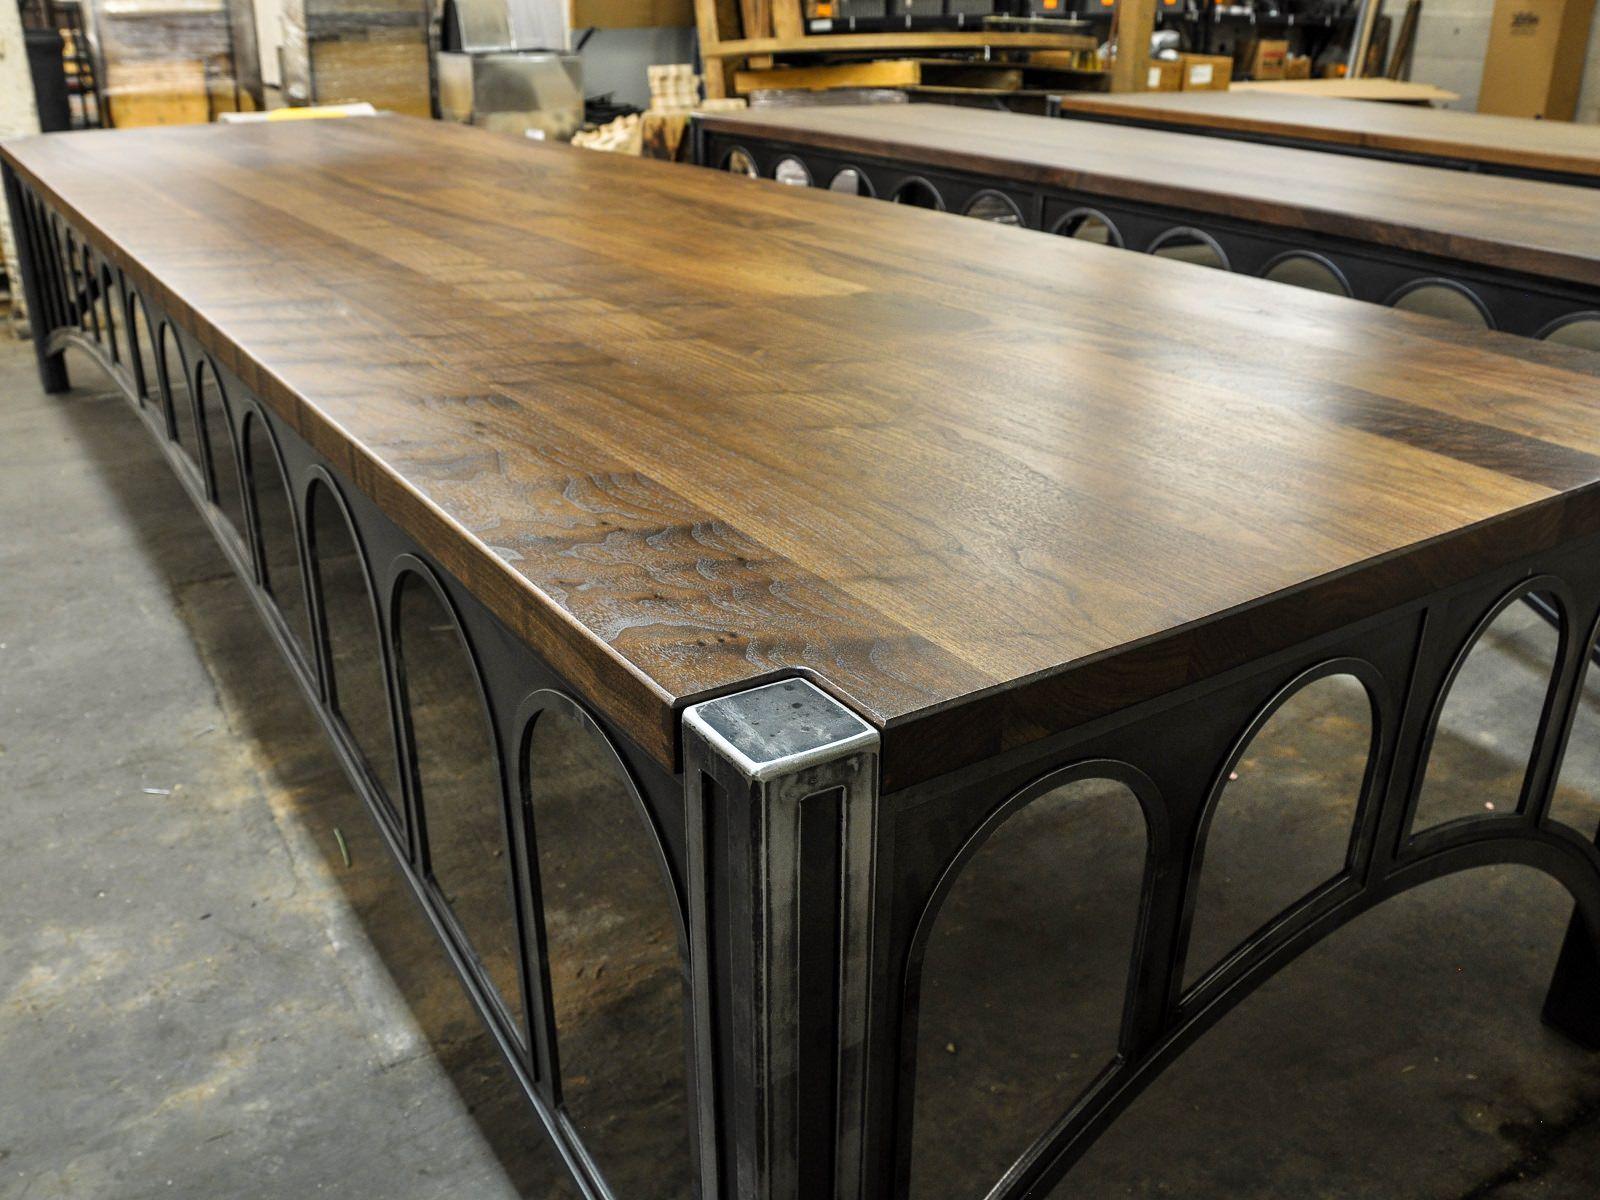 vintage kitchen cabinets for sale 33 x 19 sink walnut 42 desks | industrial furniture